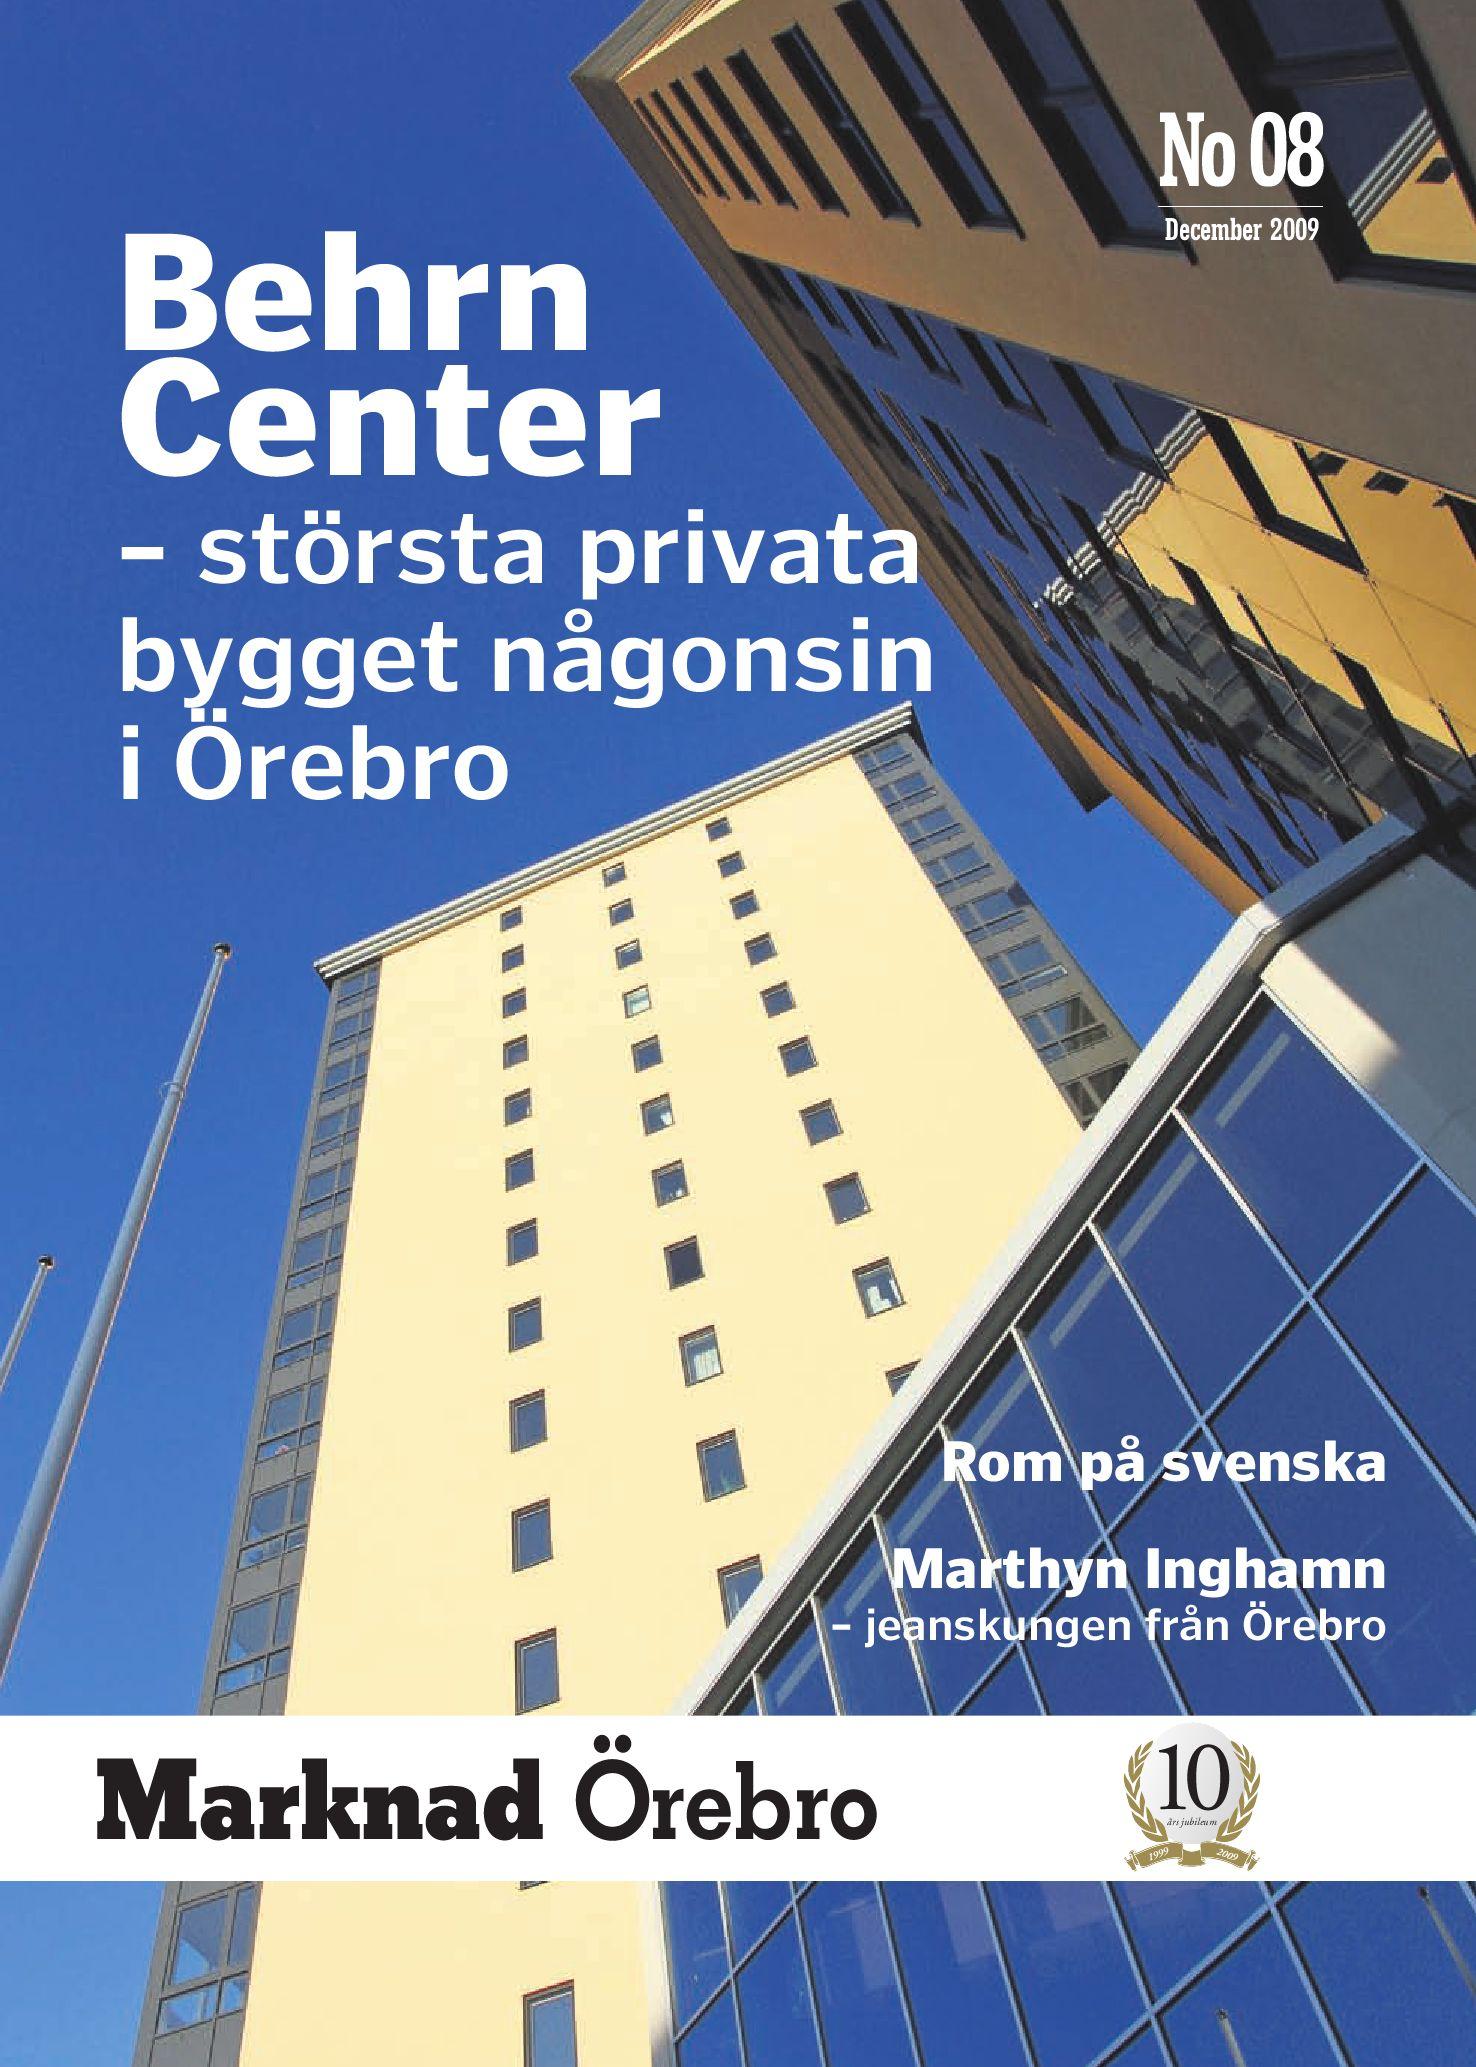 annonser privata eskorter sex i Örebro